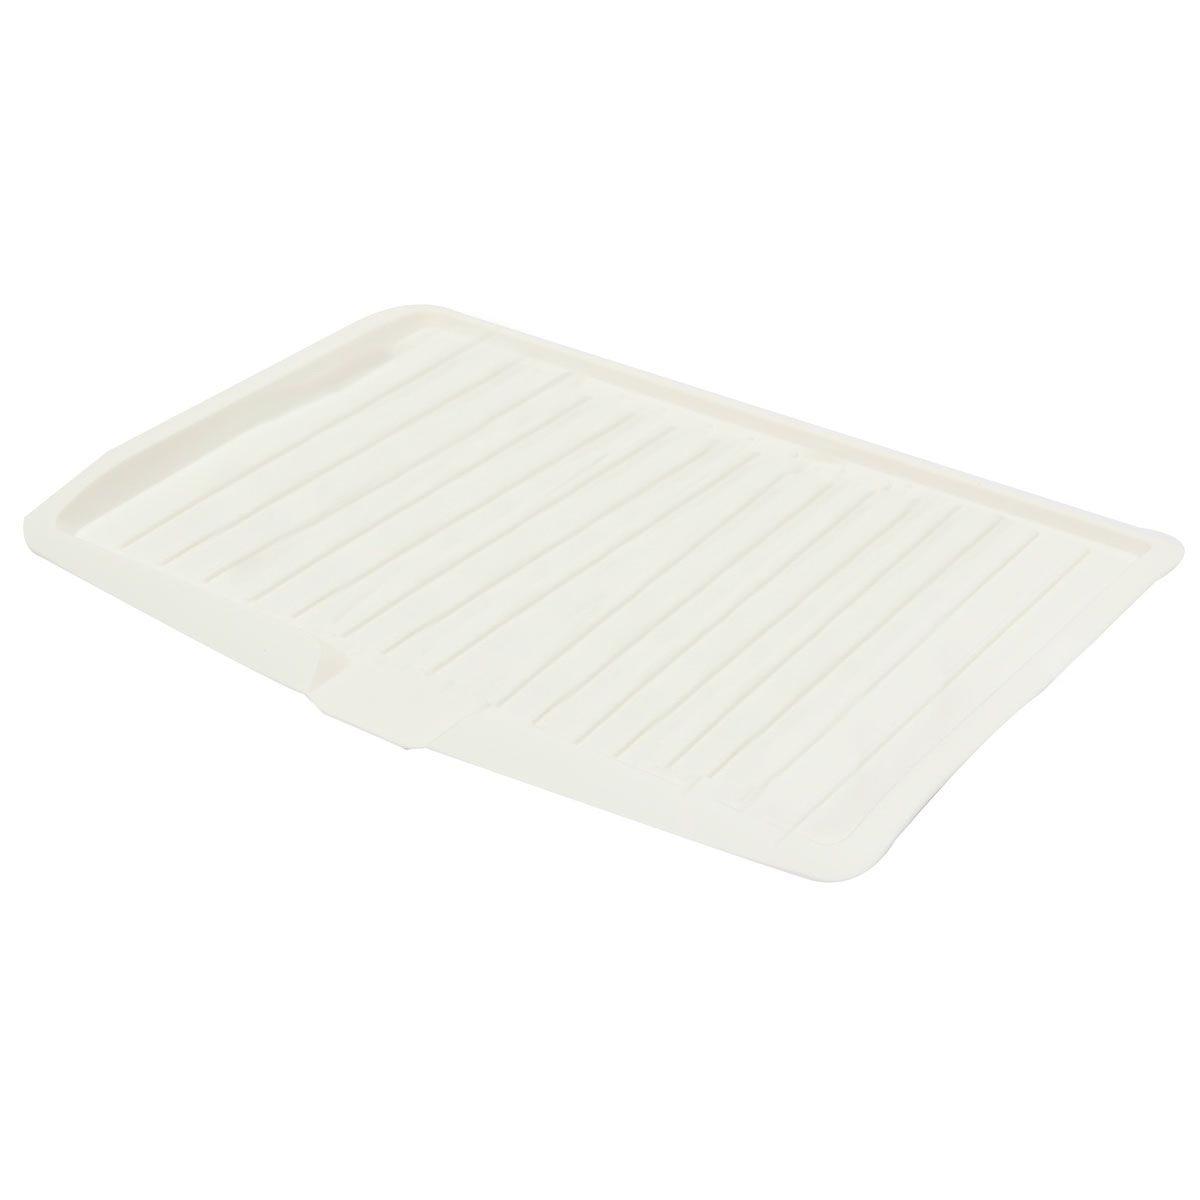 Plastic dish drainer drip tray plate cutlery rack kitchen - Escurreplatos plastico ...